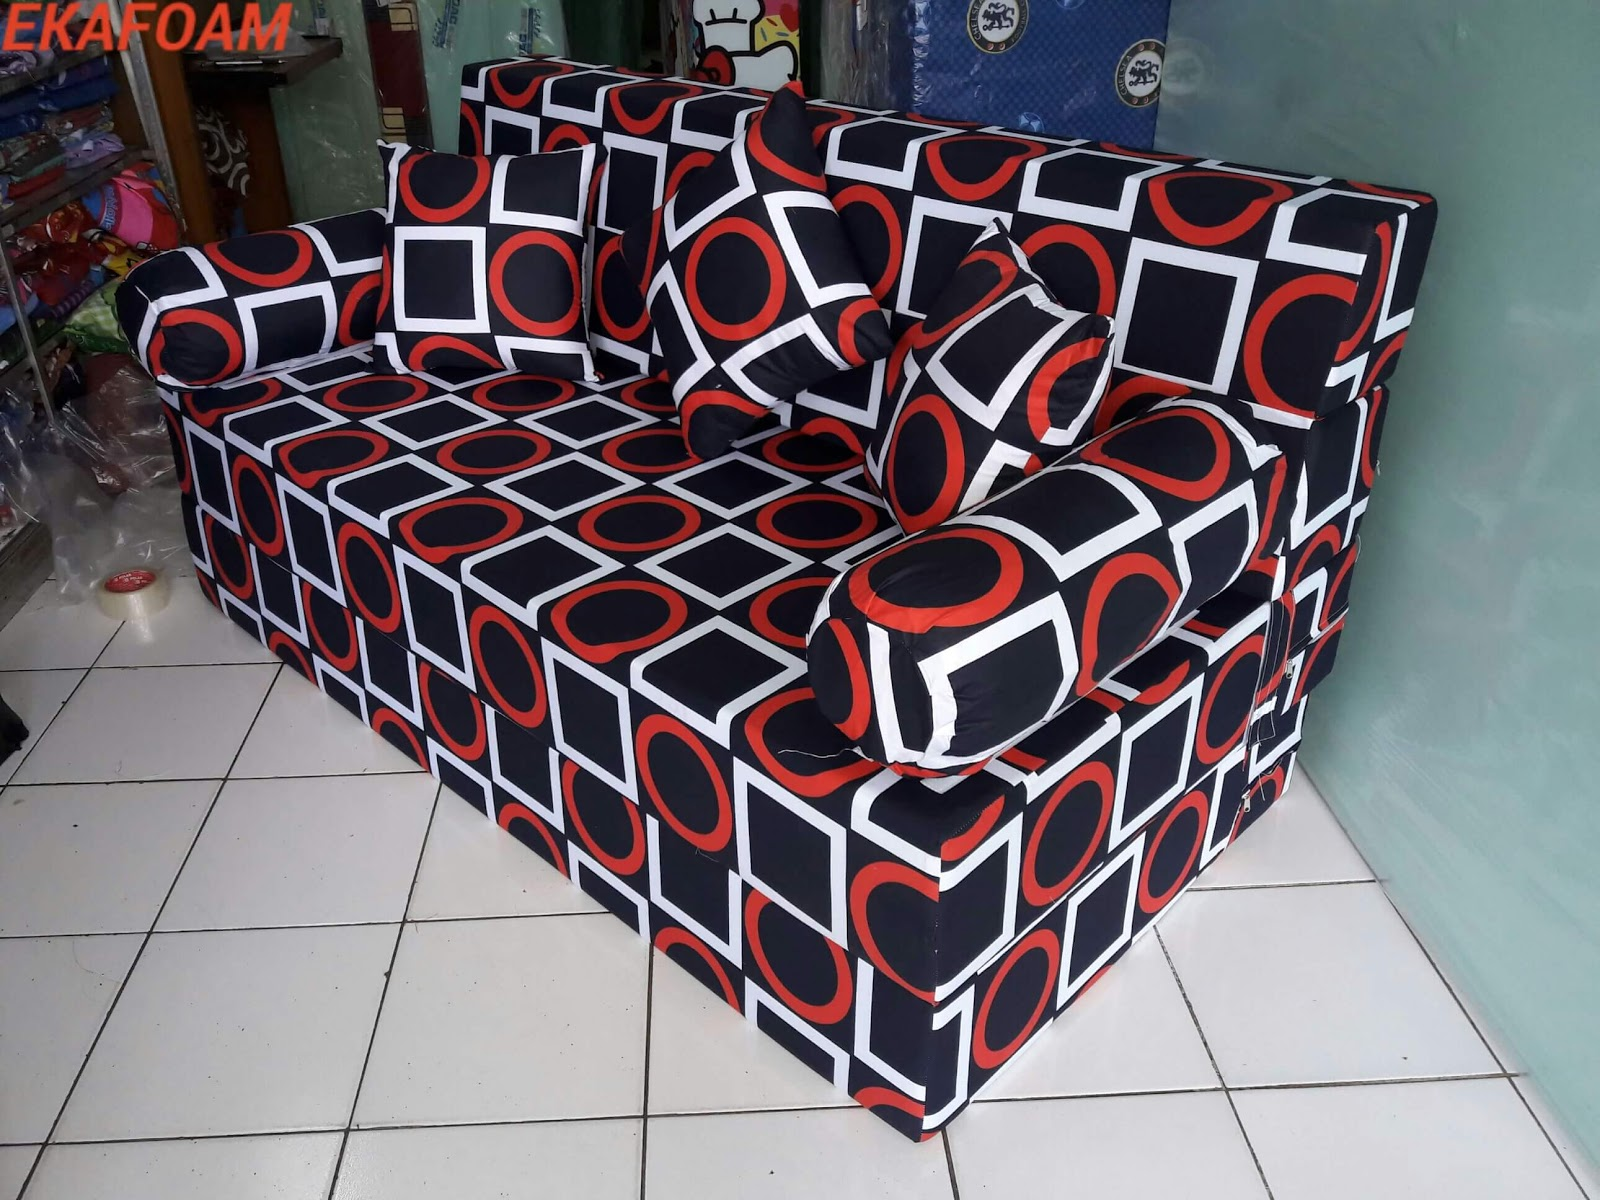 Sofa Bed Inoac Harga 2017 Luxury Beds Melbourne Full Motif Agen Resmi Kasur Busa